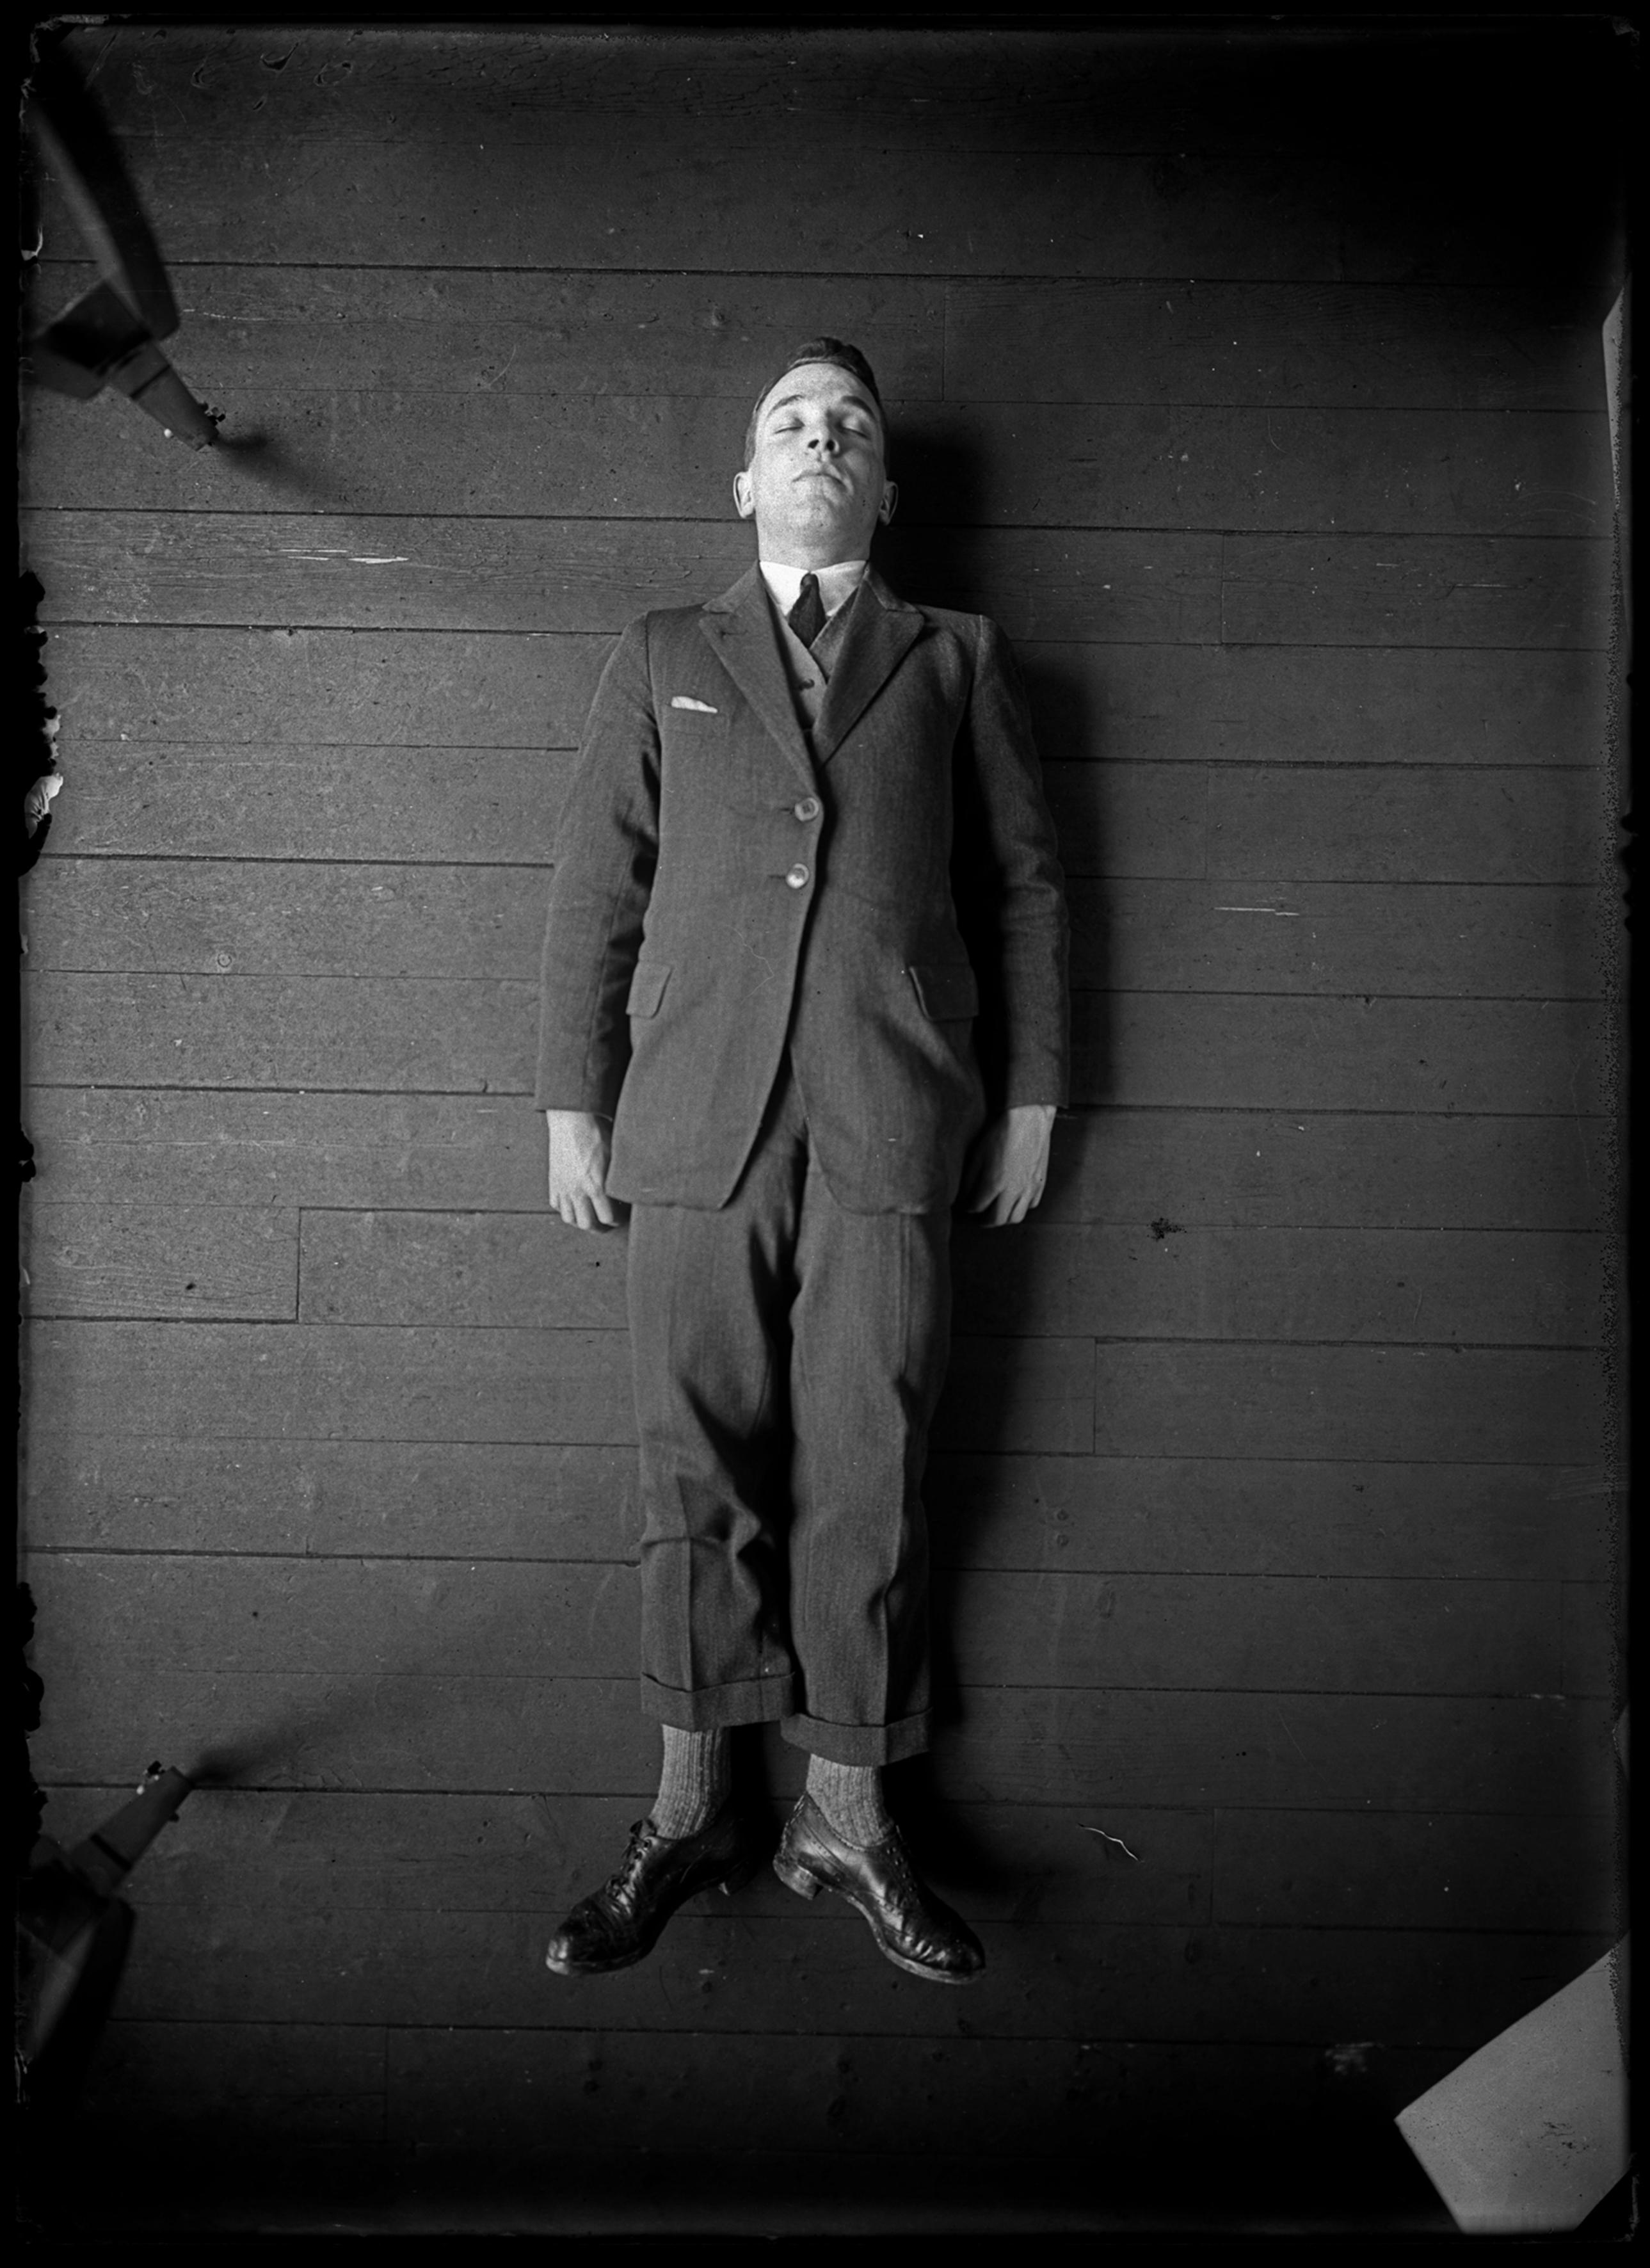 Rodolphe A Reiss, Simulated corpse, demonstration of the Bertillon metric photography system, 1925. © RA REISS. Courtesy of Collection of the Institut de Police Scientifique et de Criminologie de Lausanne